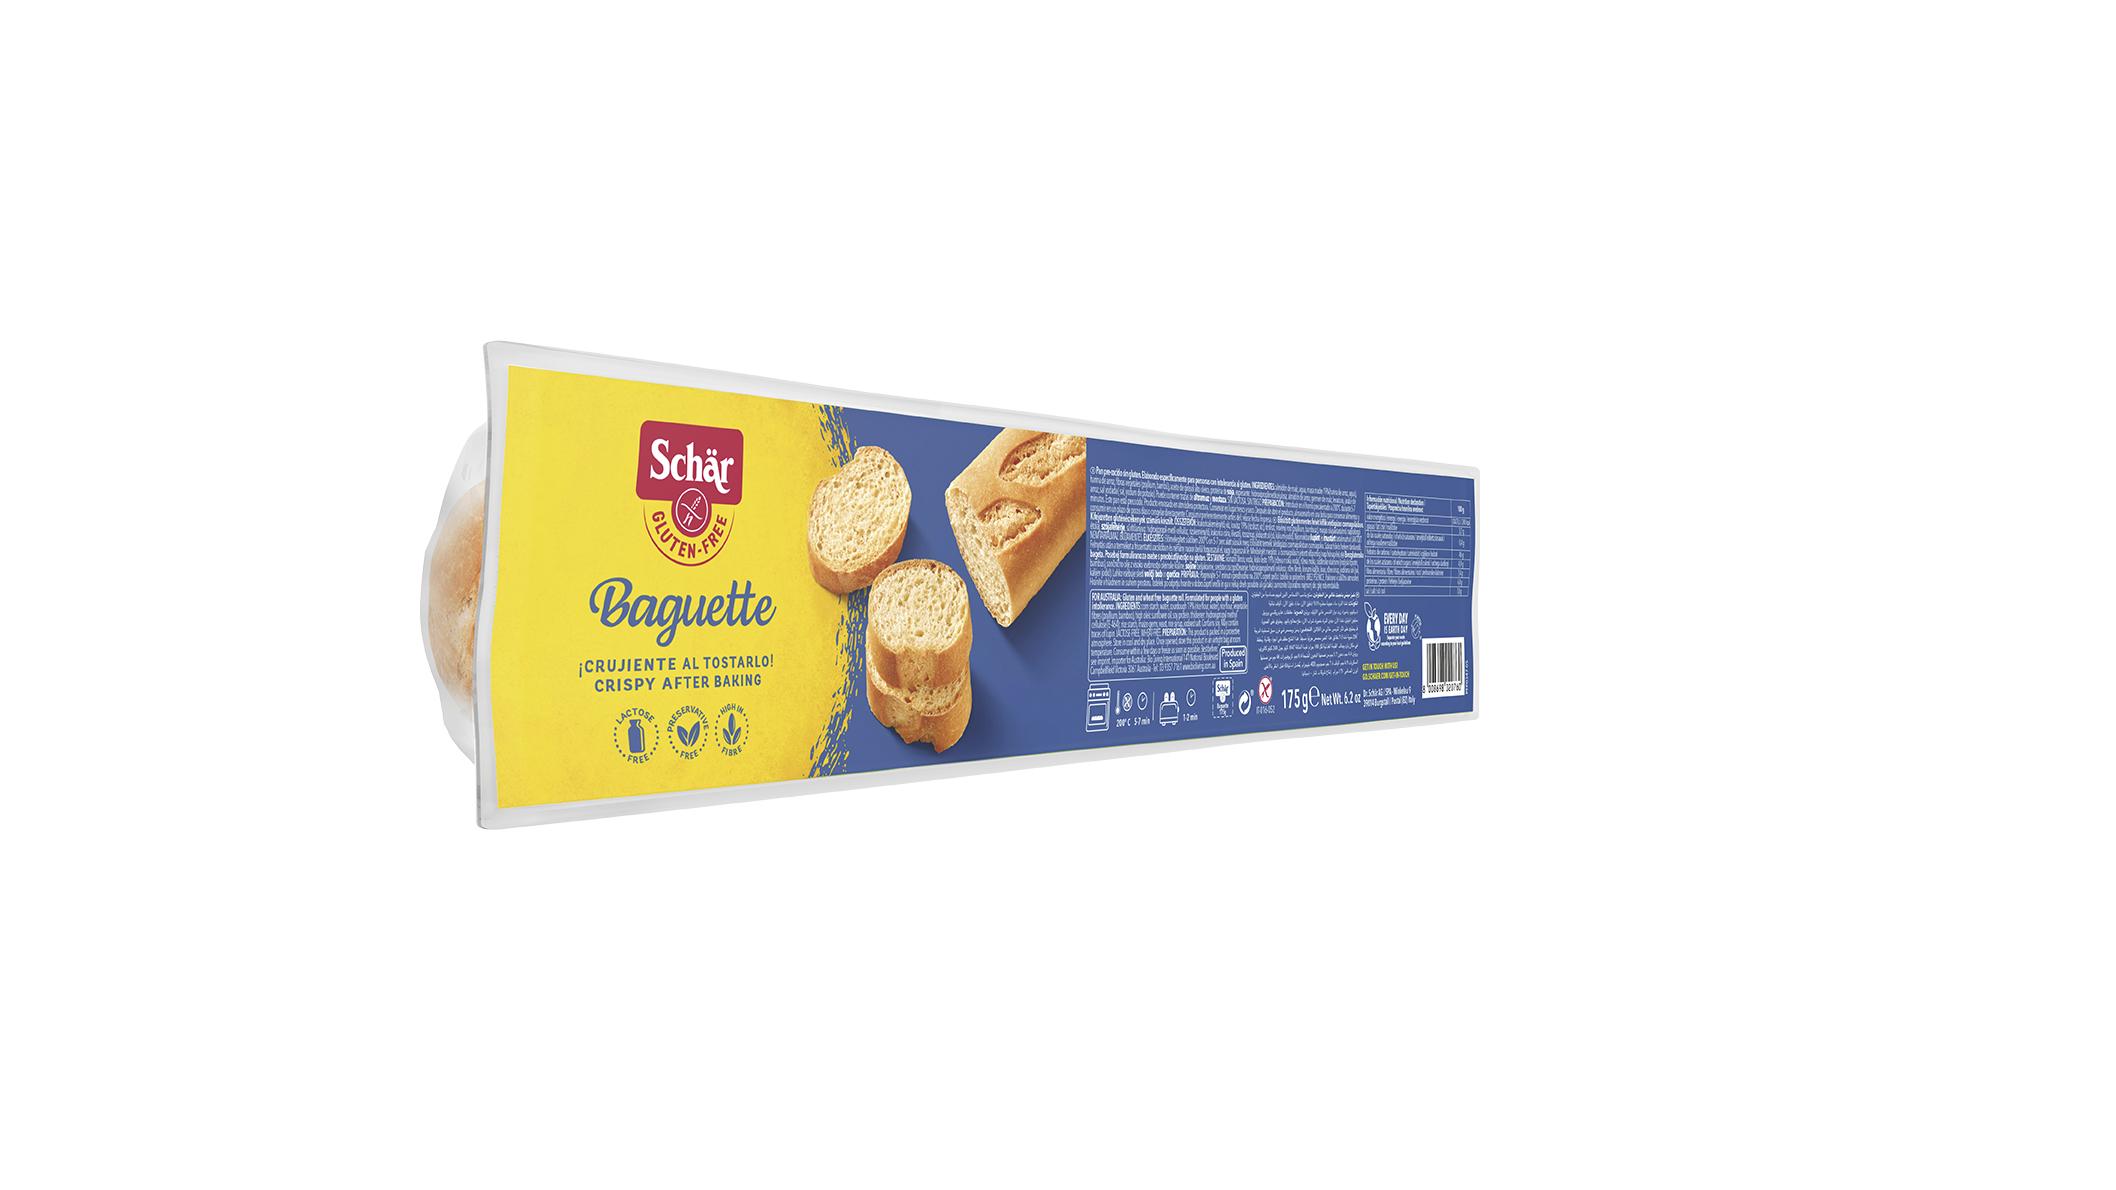 Brezglutenska francoska štruca – Baguette